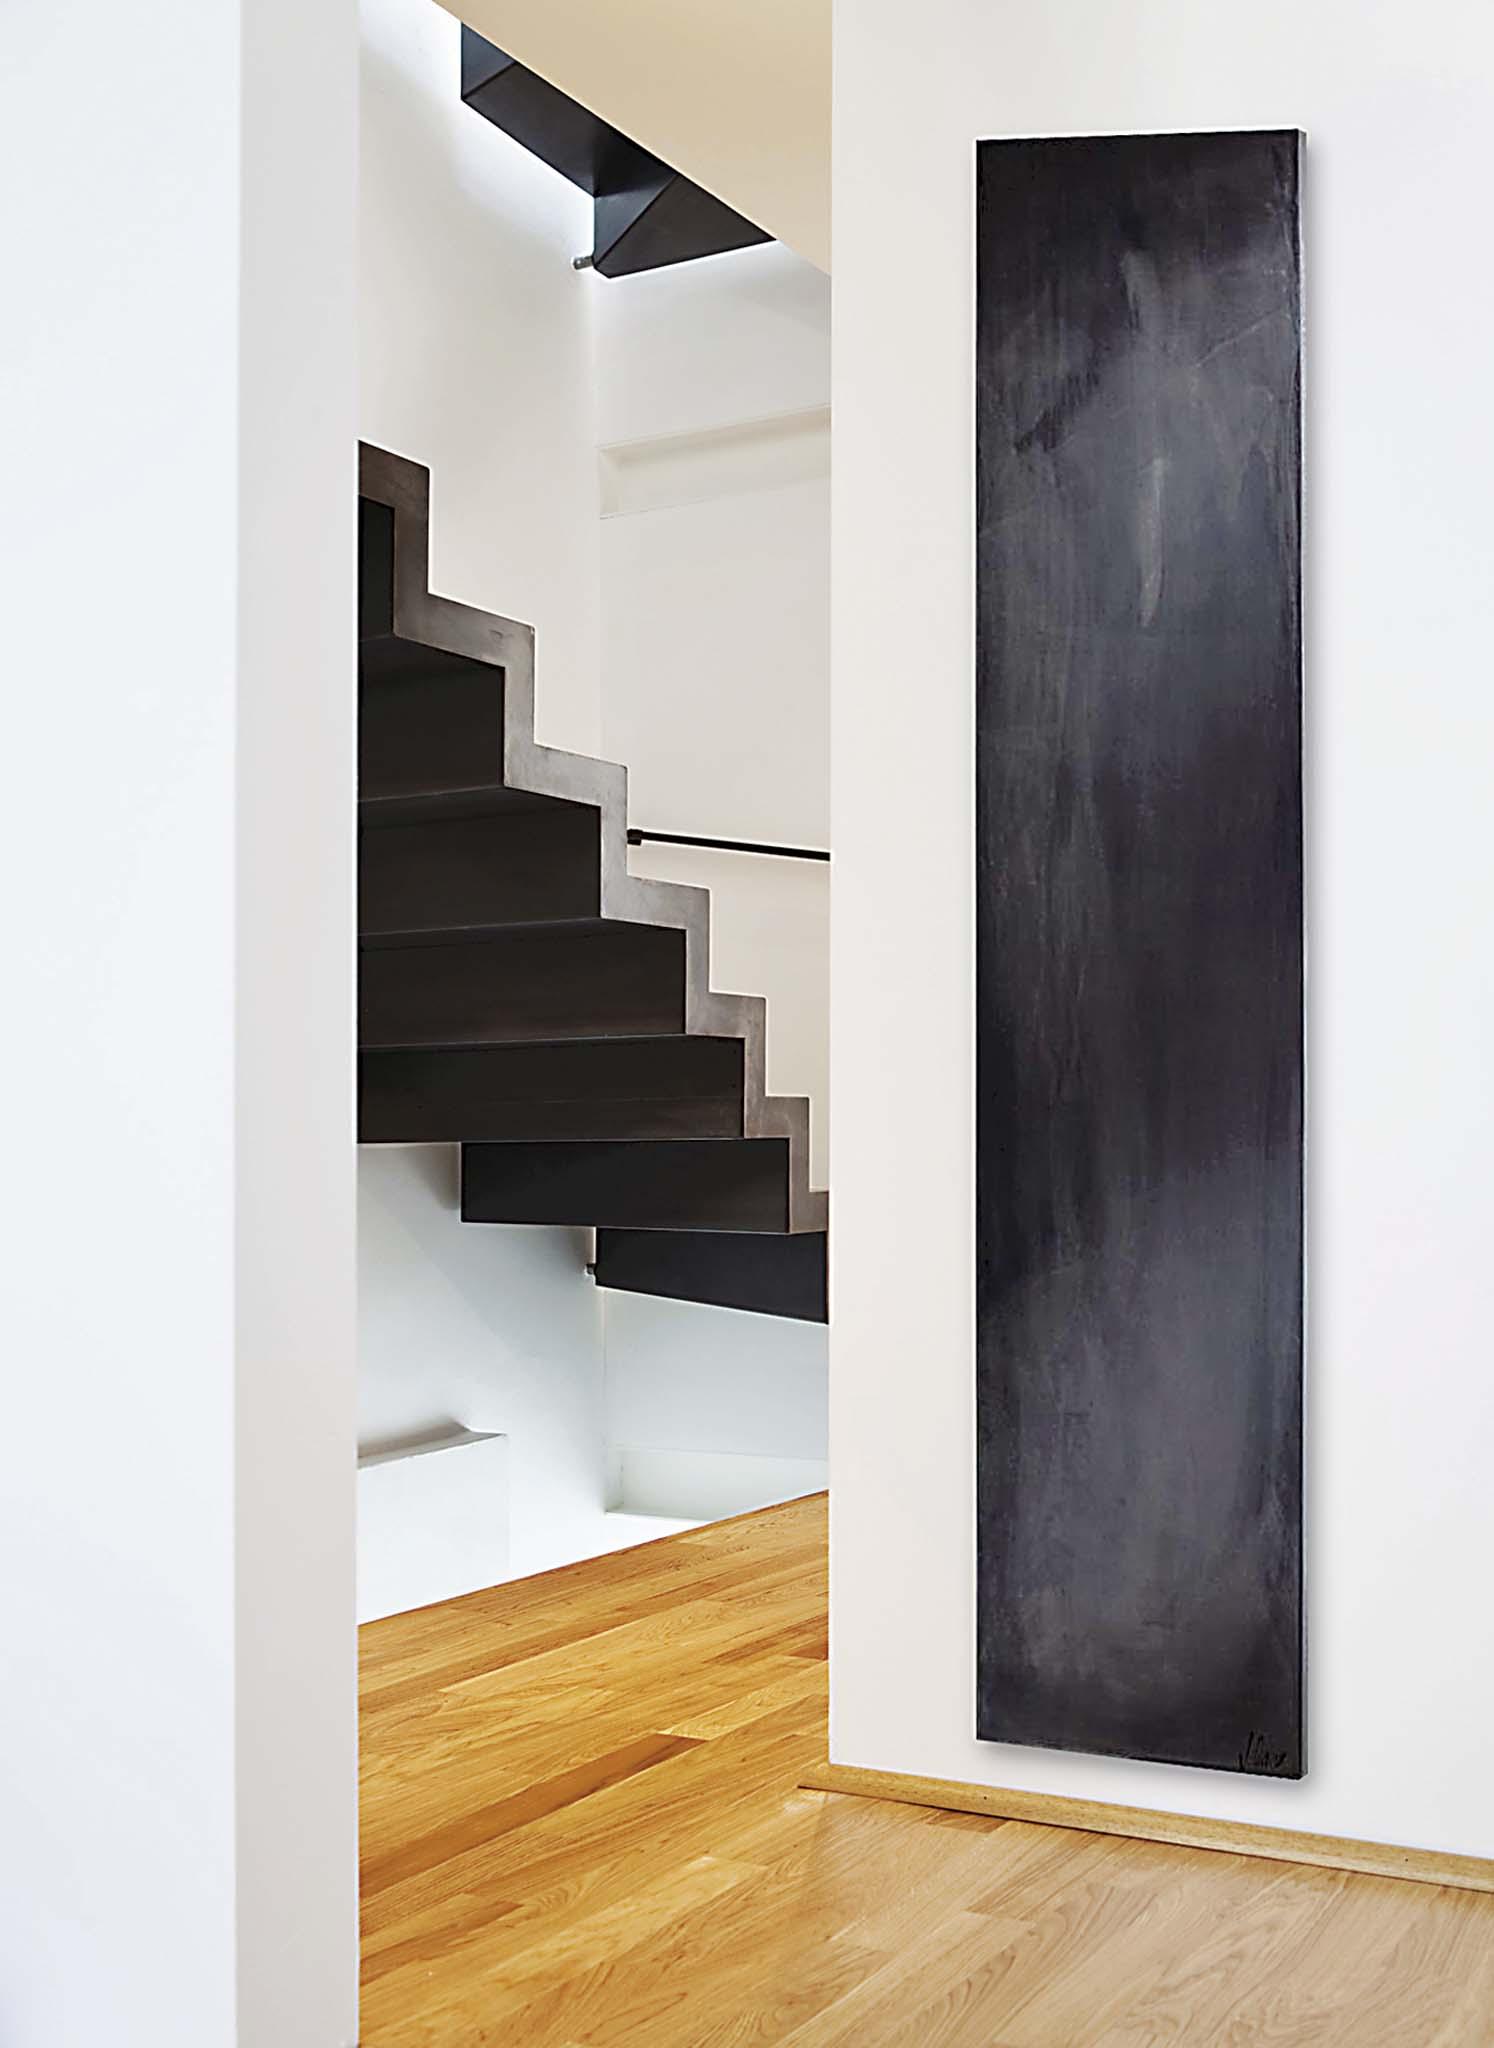 solutions de chauffage unib ton cinier. Black Bedroom Furniture Sets. Home Design Ideas